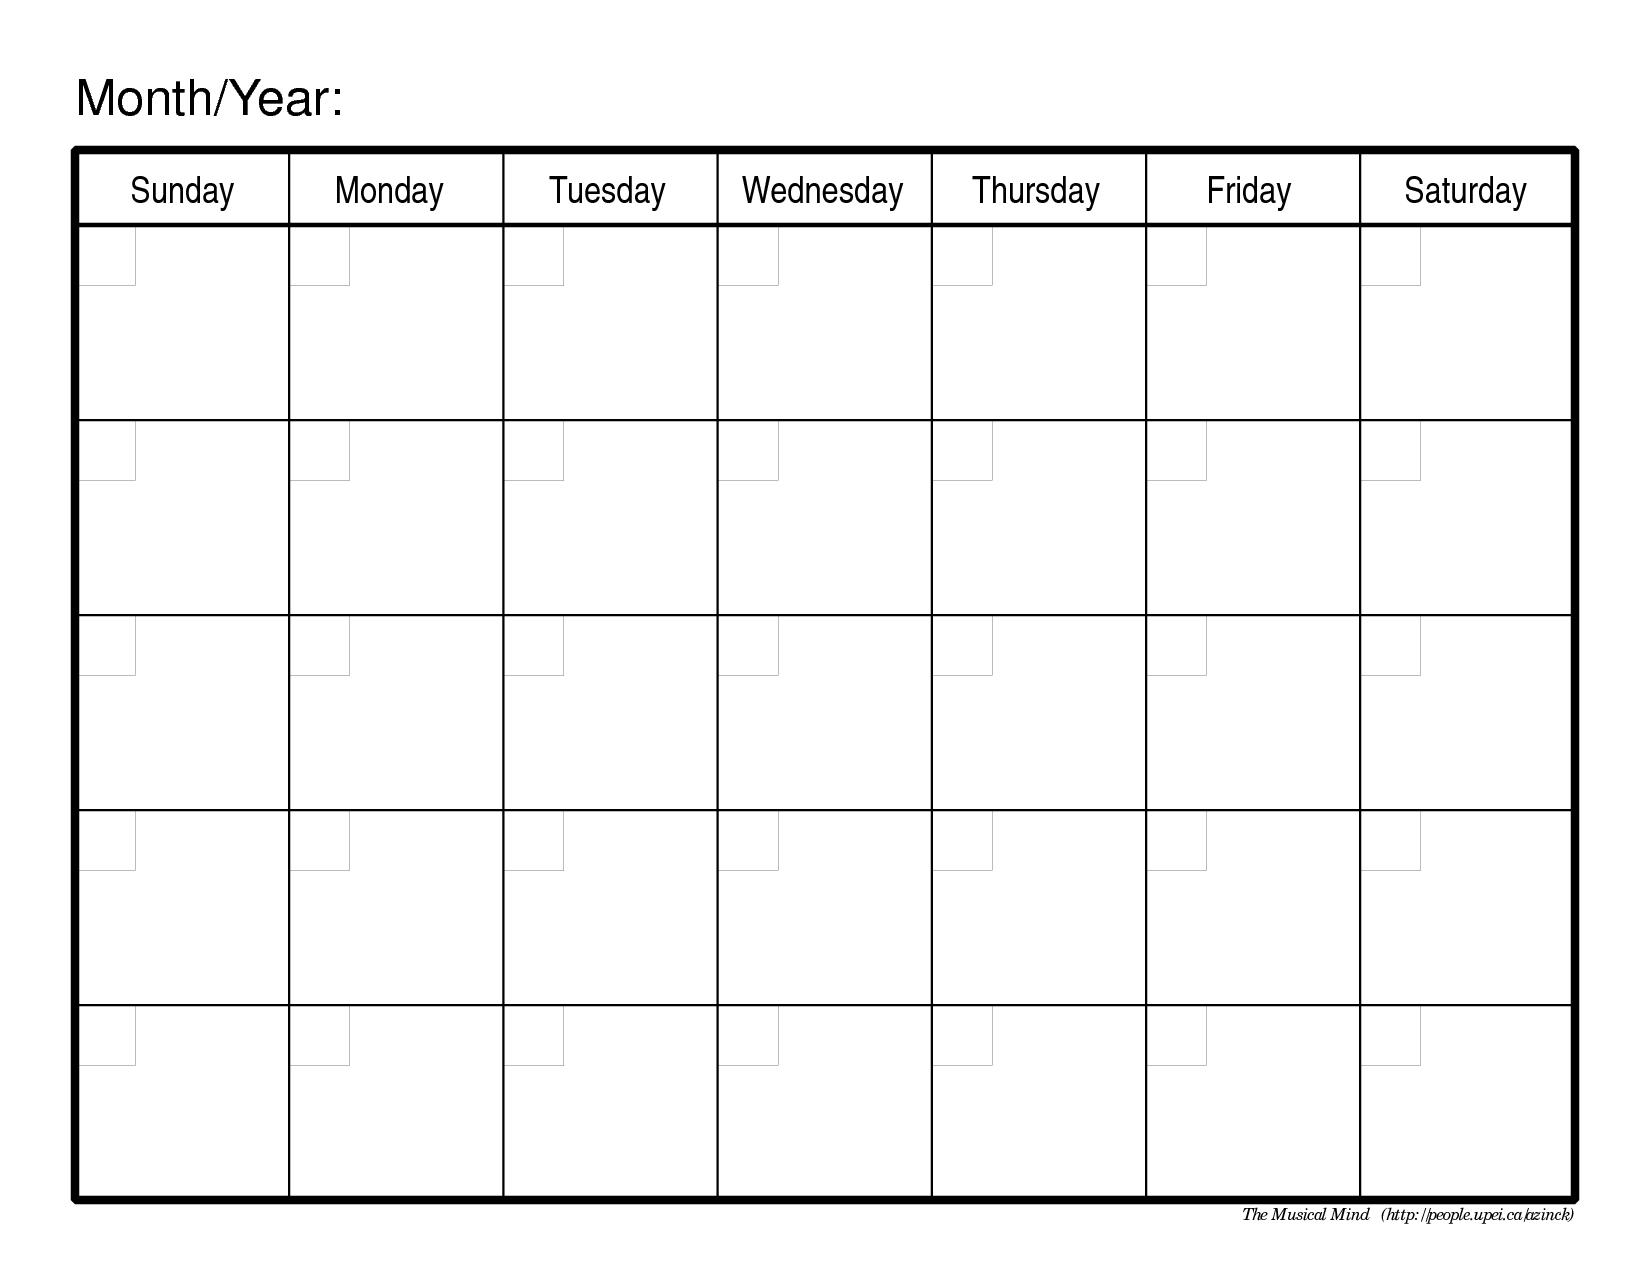 Calendar Templates Printable Free Fieldstation.co | Self-Free Printable Blank Calendar Grid